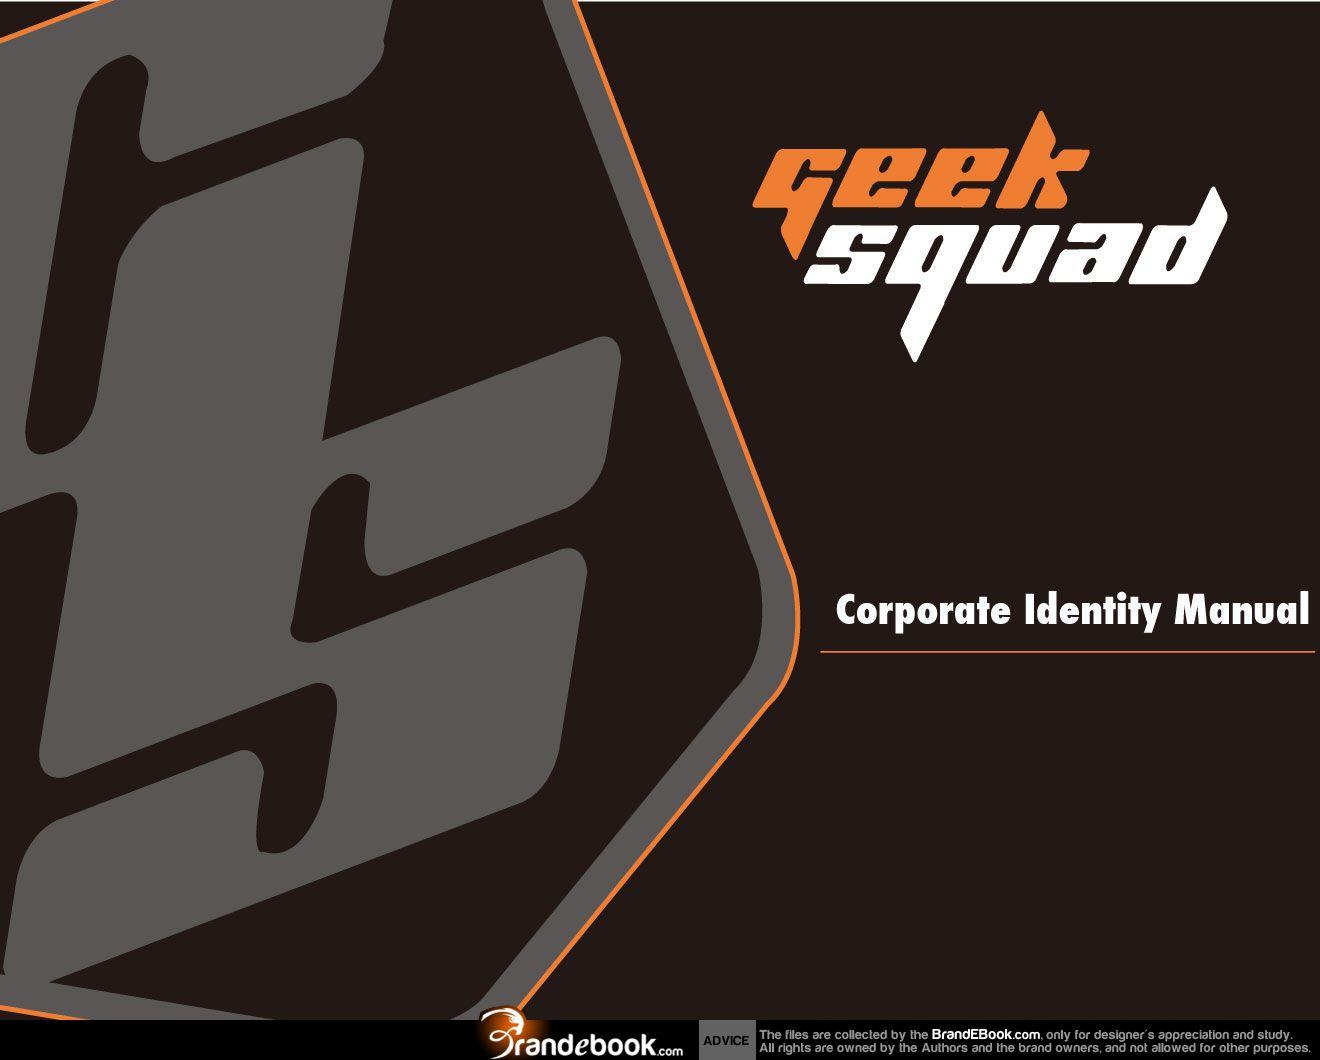 computer and phone logo usage download computer and phone rh brandebook com Geek Squad Memes Geek Squad Memes